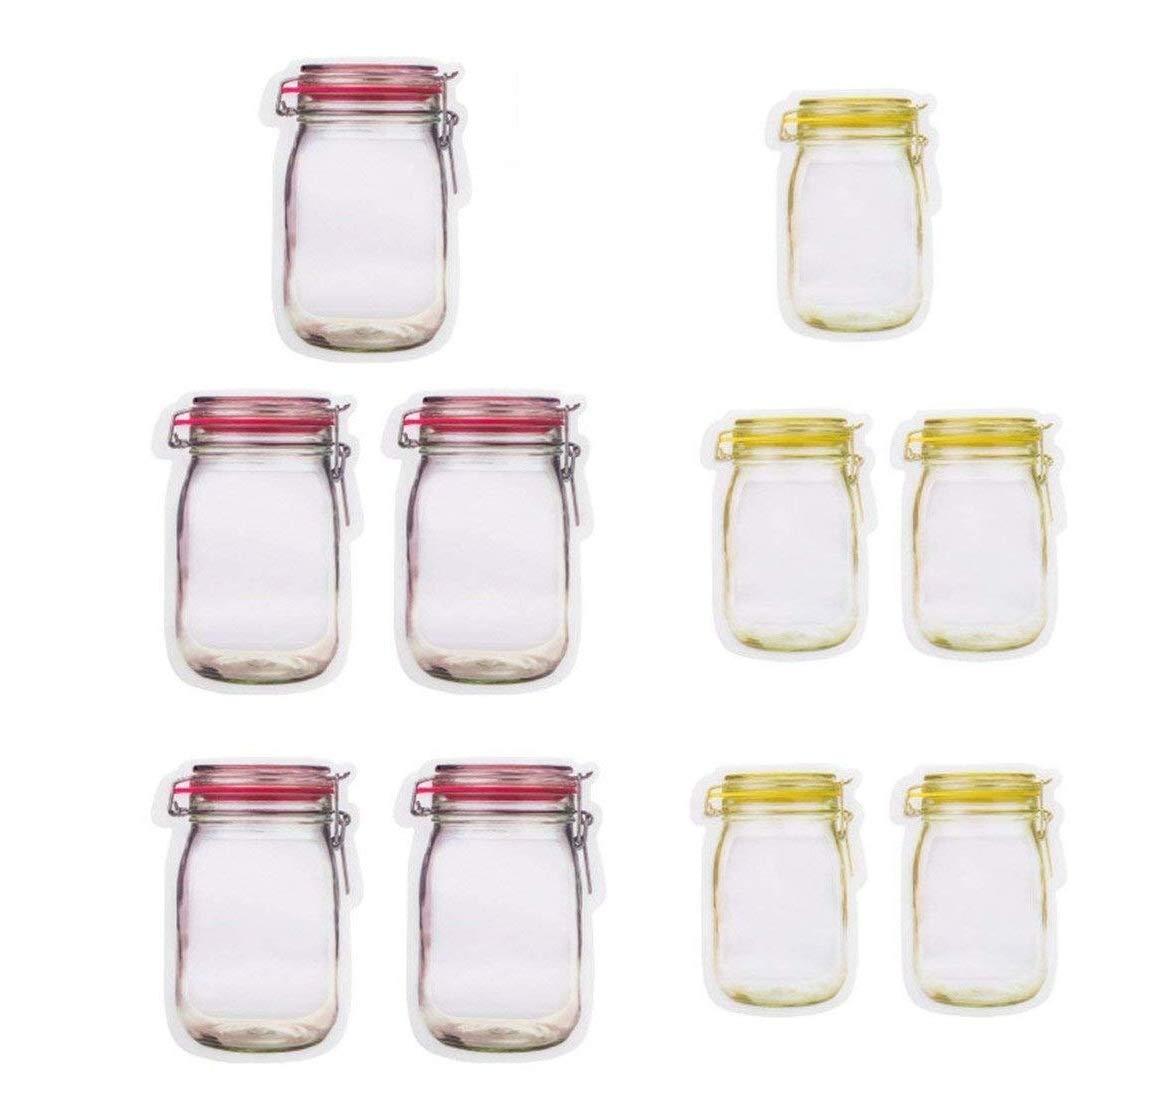 ABTP 10 Pieces Mason Jar Pattern Food Saver Storage Bags Set 500ml x 5 & 150ml x 5 Red/Yellow